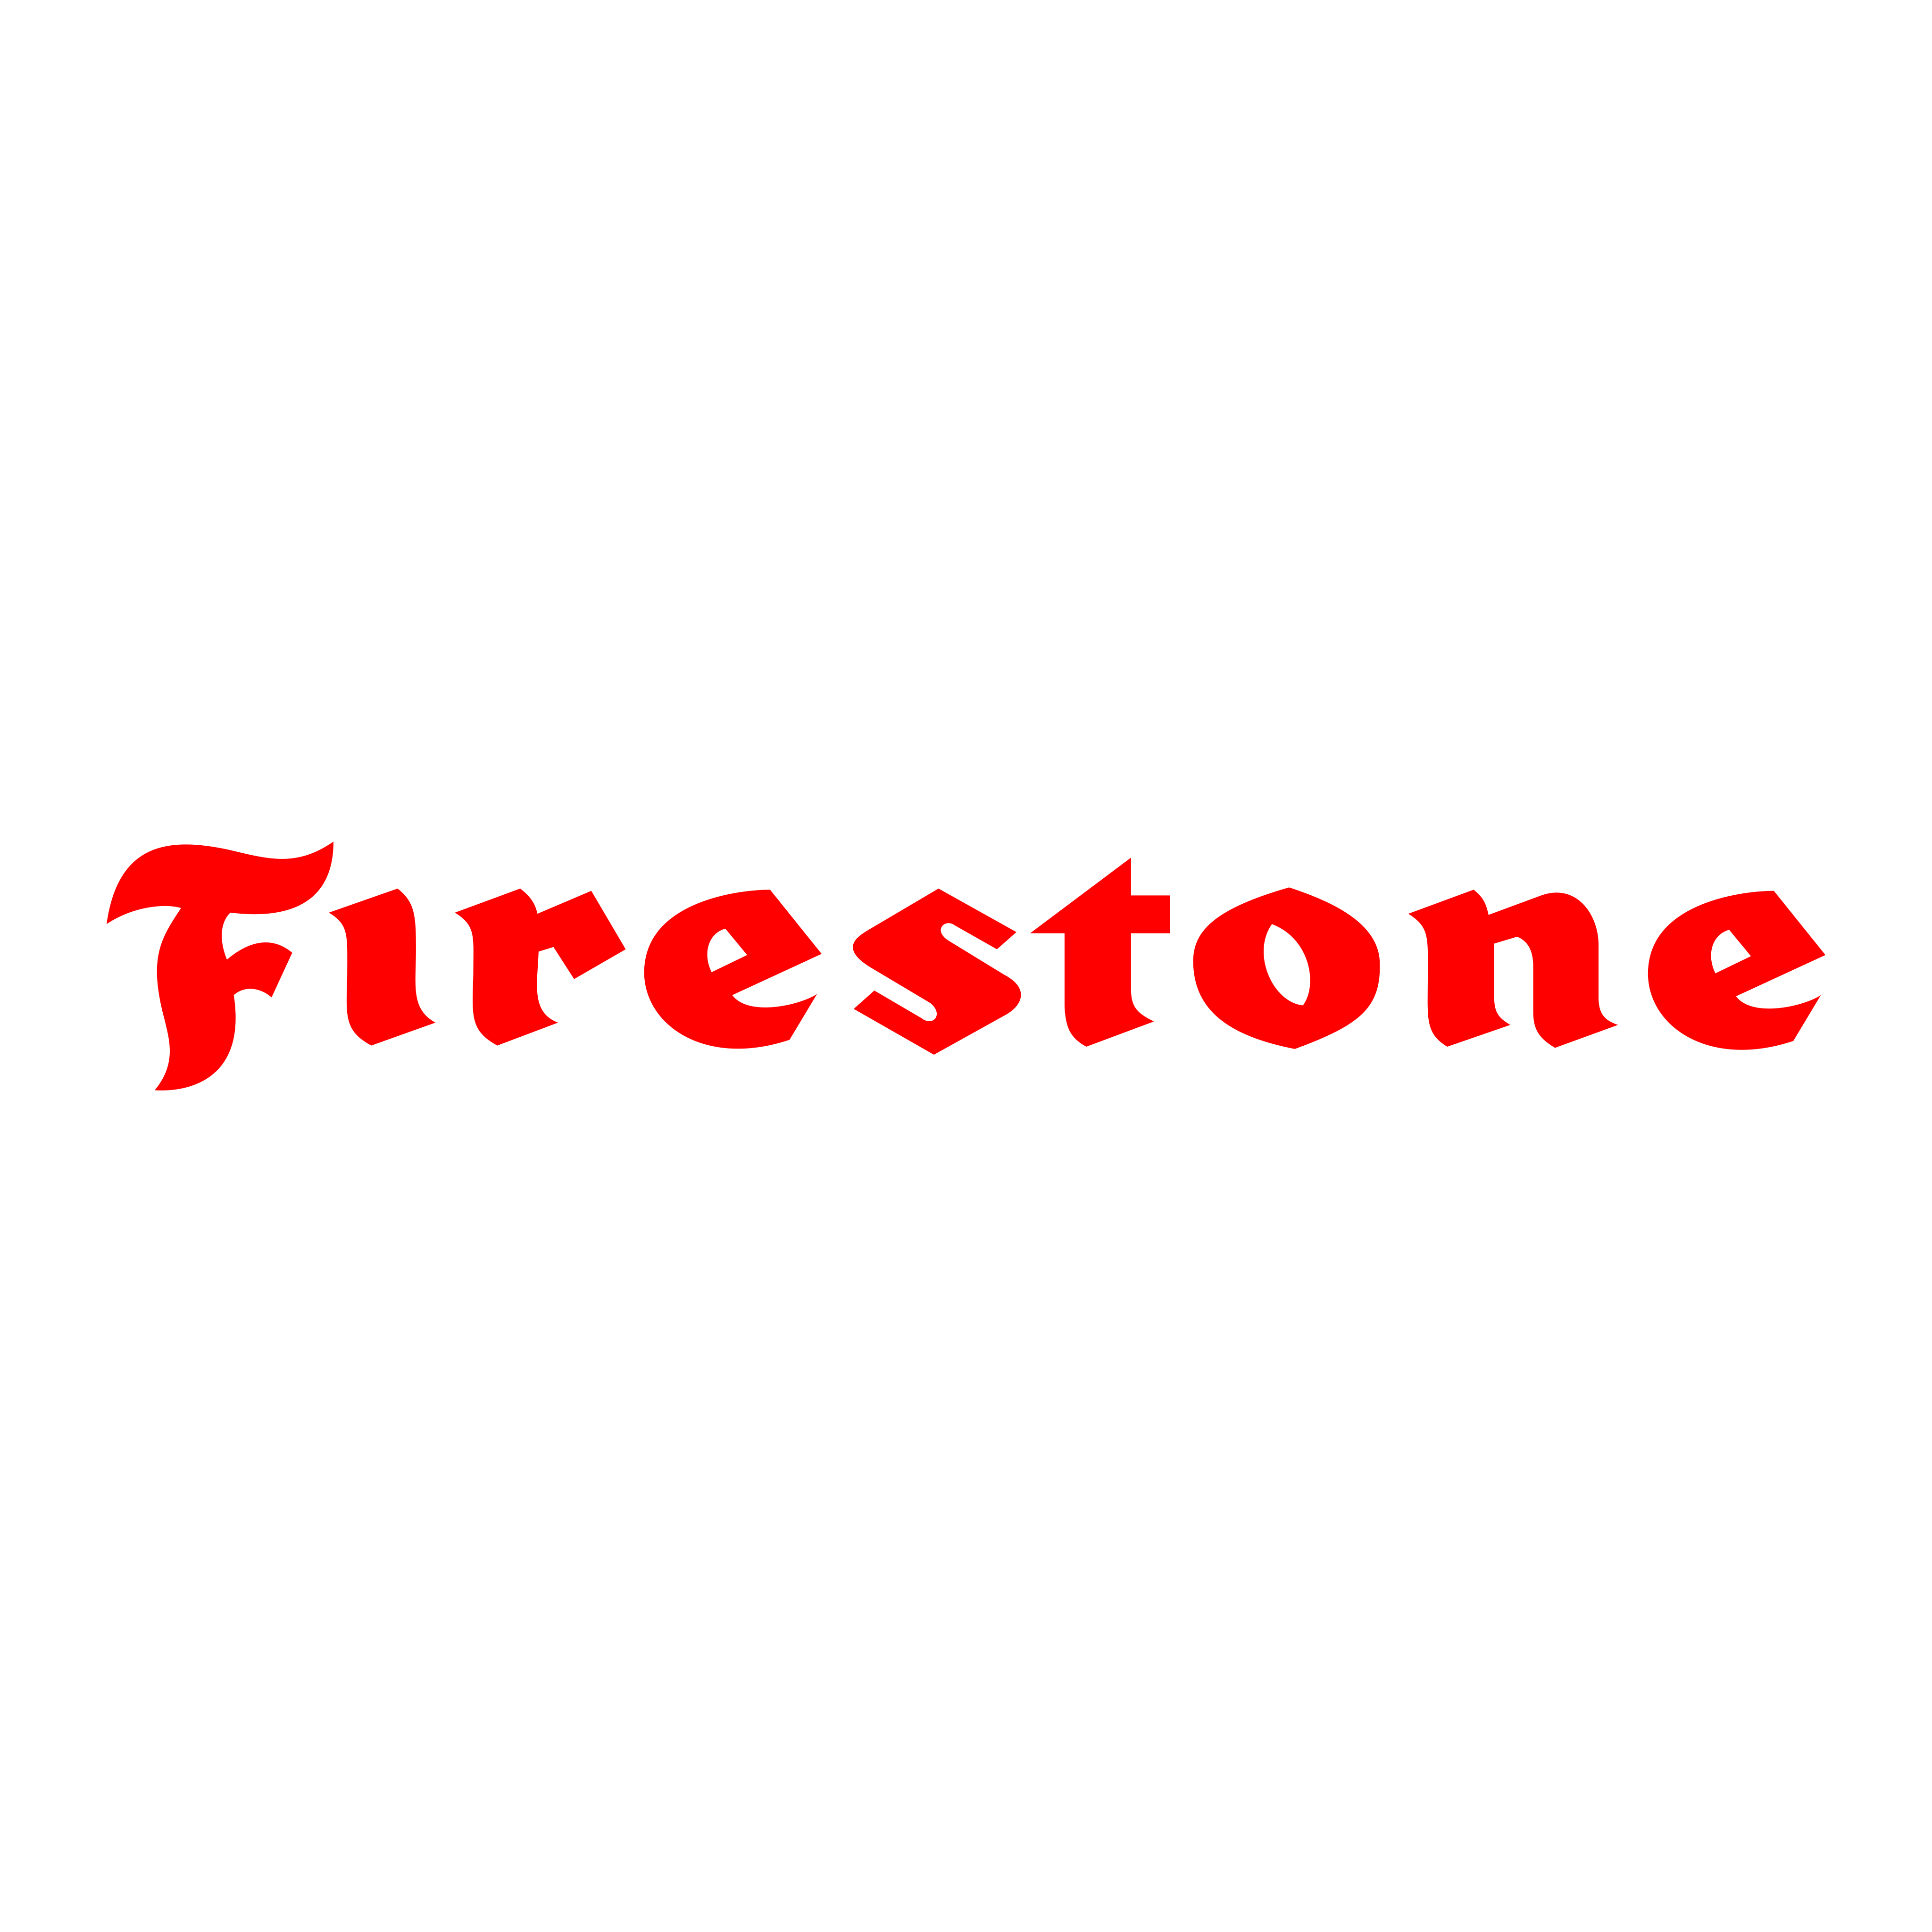 firestone logo 0 - Firestone Logo